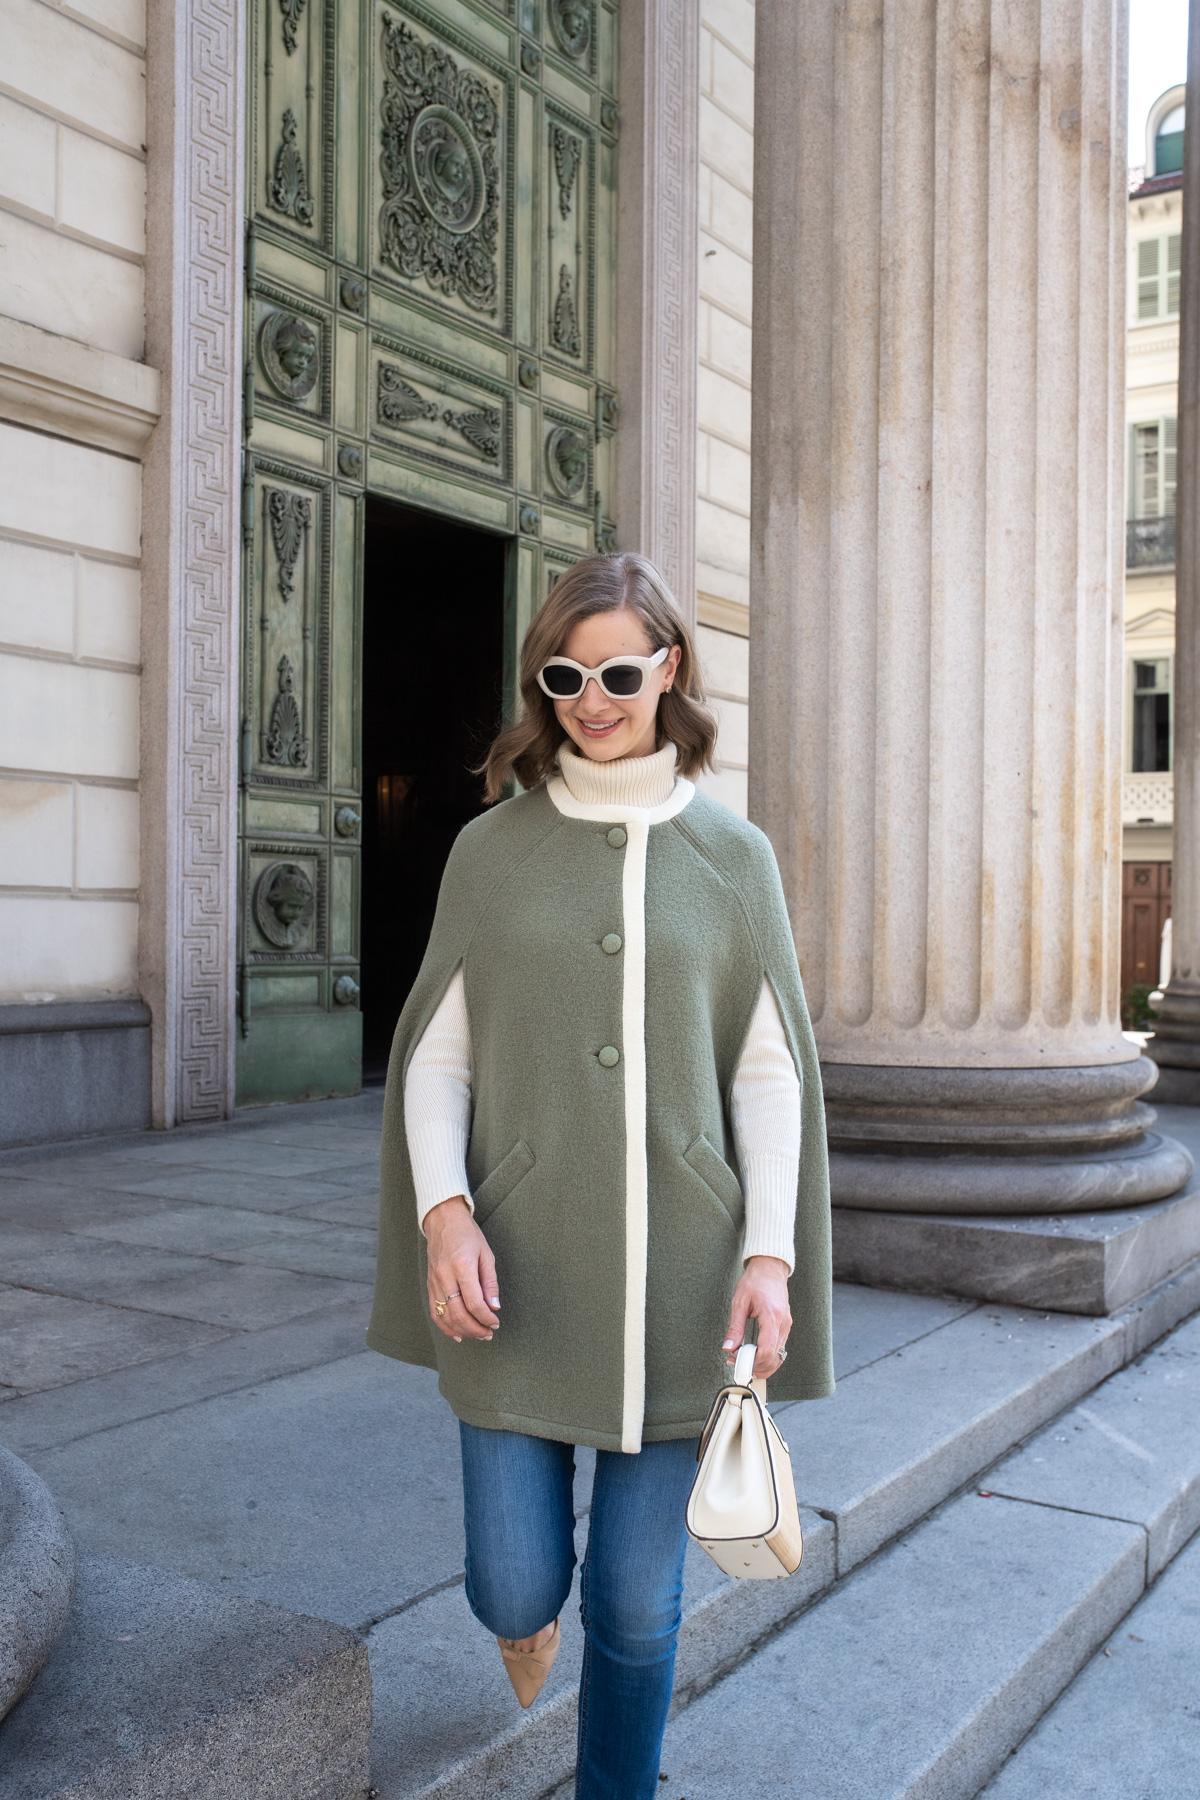 Stacie Flinner x Marta Scarampi Torino Italy Trip